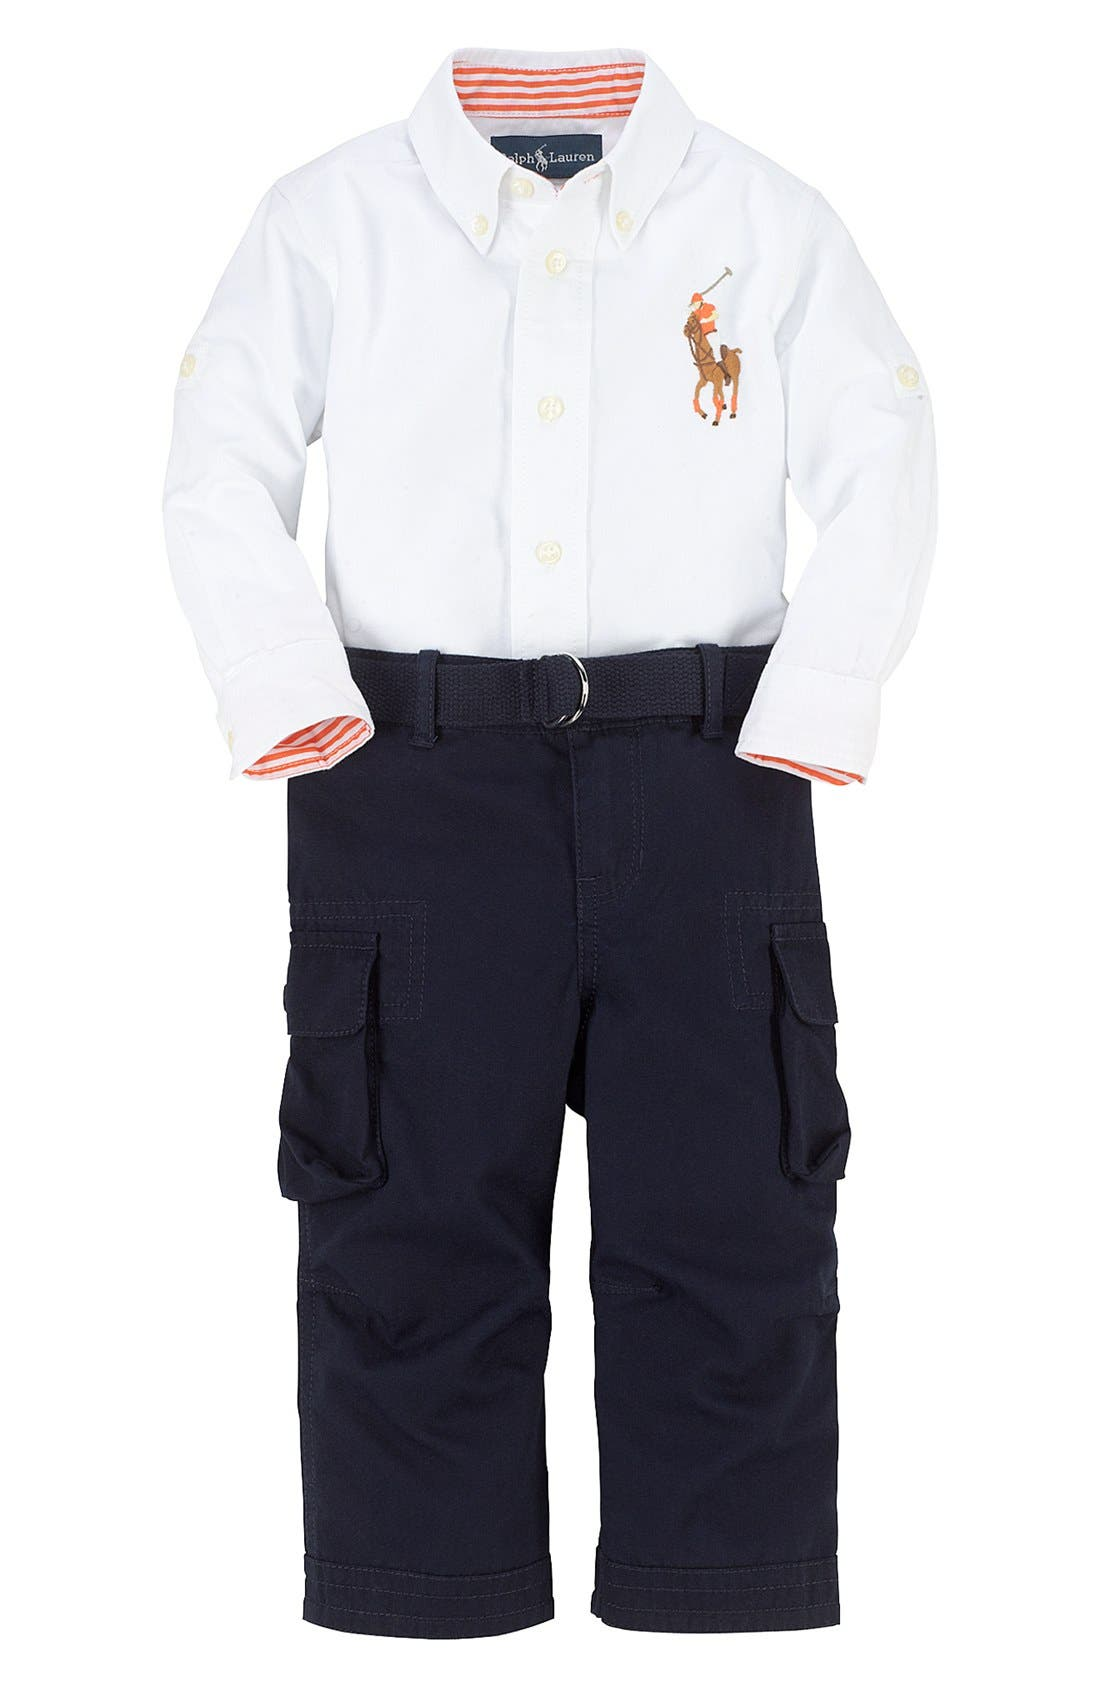 Alternate Image 1 Selected - Ralph Lauren Woven Shirt & Cargo Pants (Baby Boys)